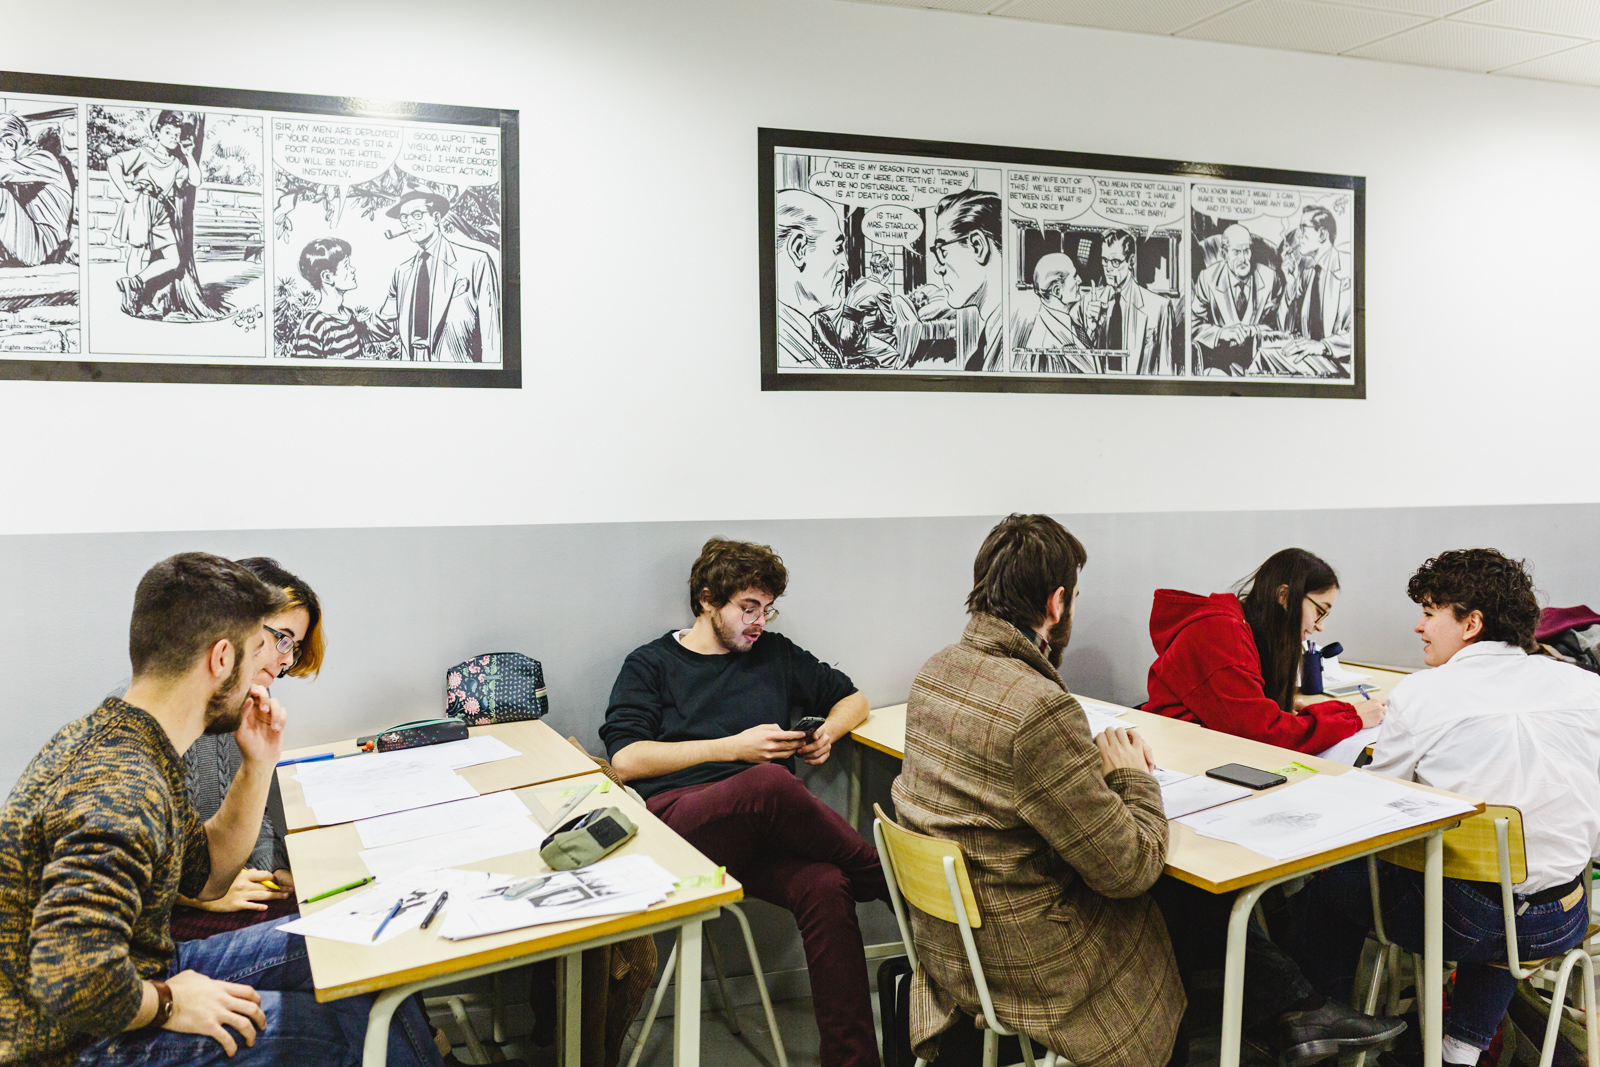 escuela-de-comic-joso-barcelona-fotografia-corporativa-misshappyflash-24.jpg